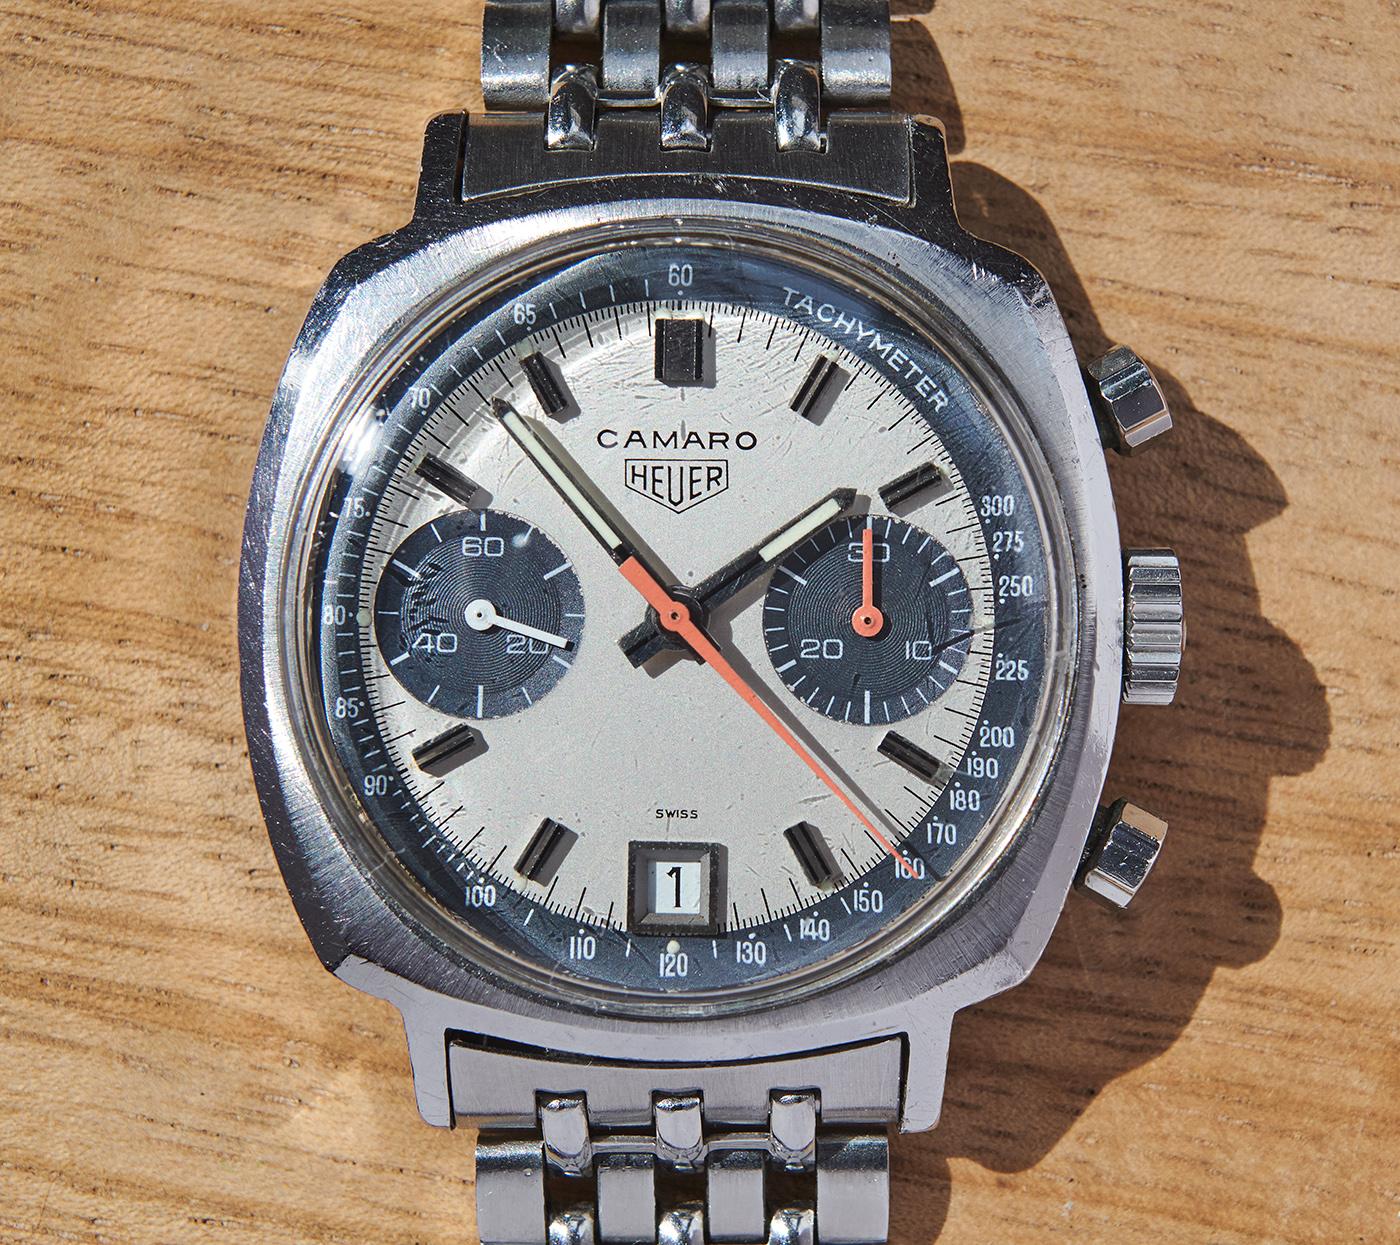 Heuer Camaro 7843 dato exotic dial